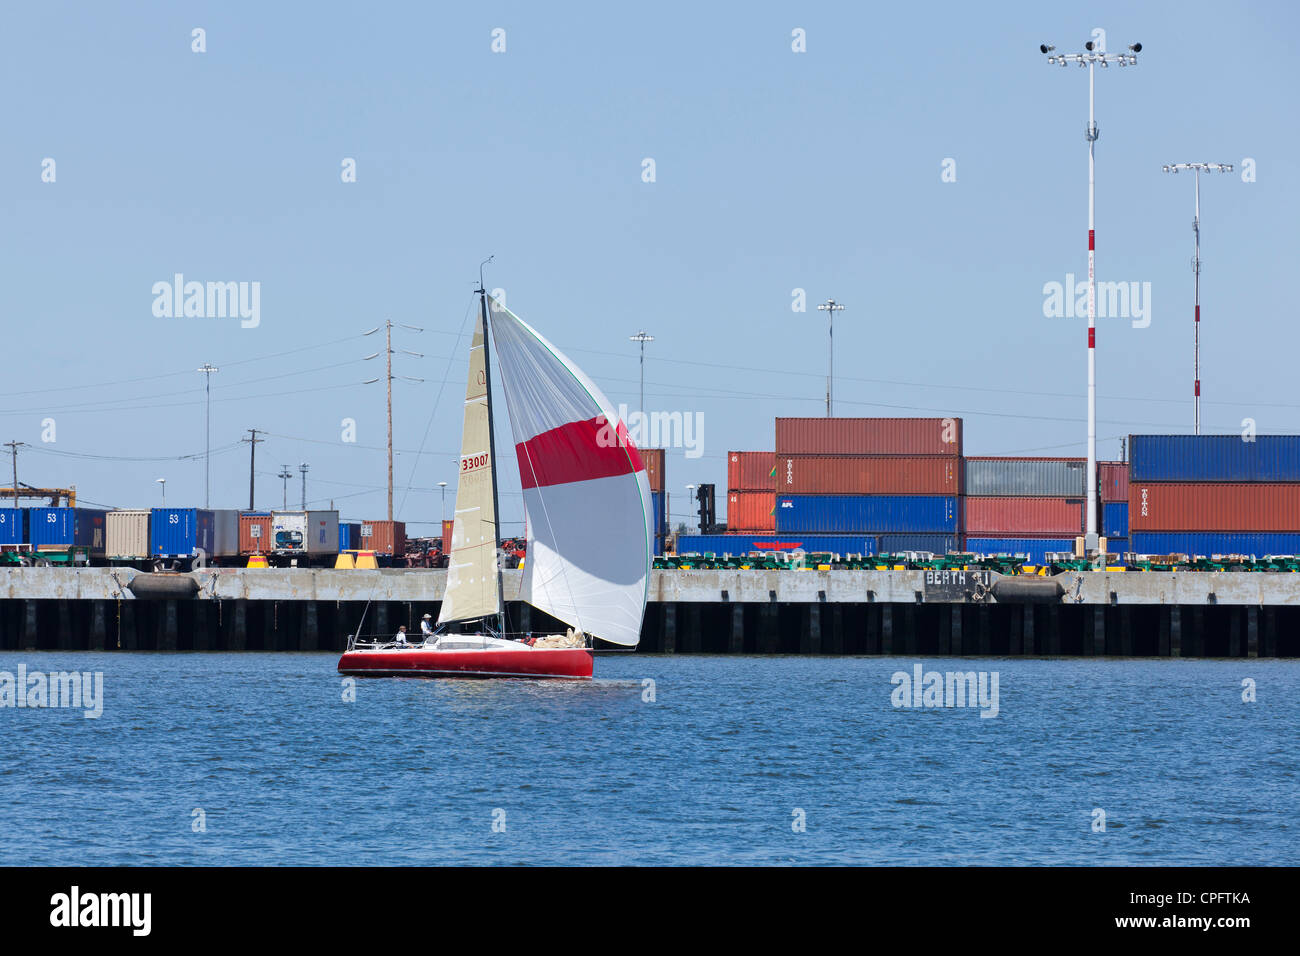 Sailboat in industrial harbor - Stock Image